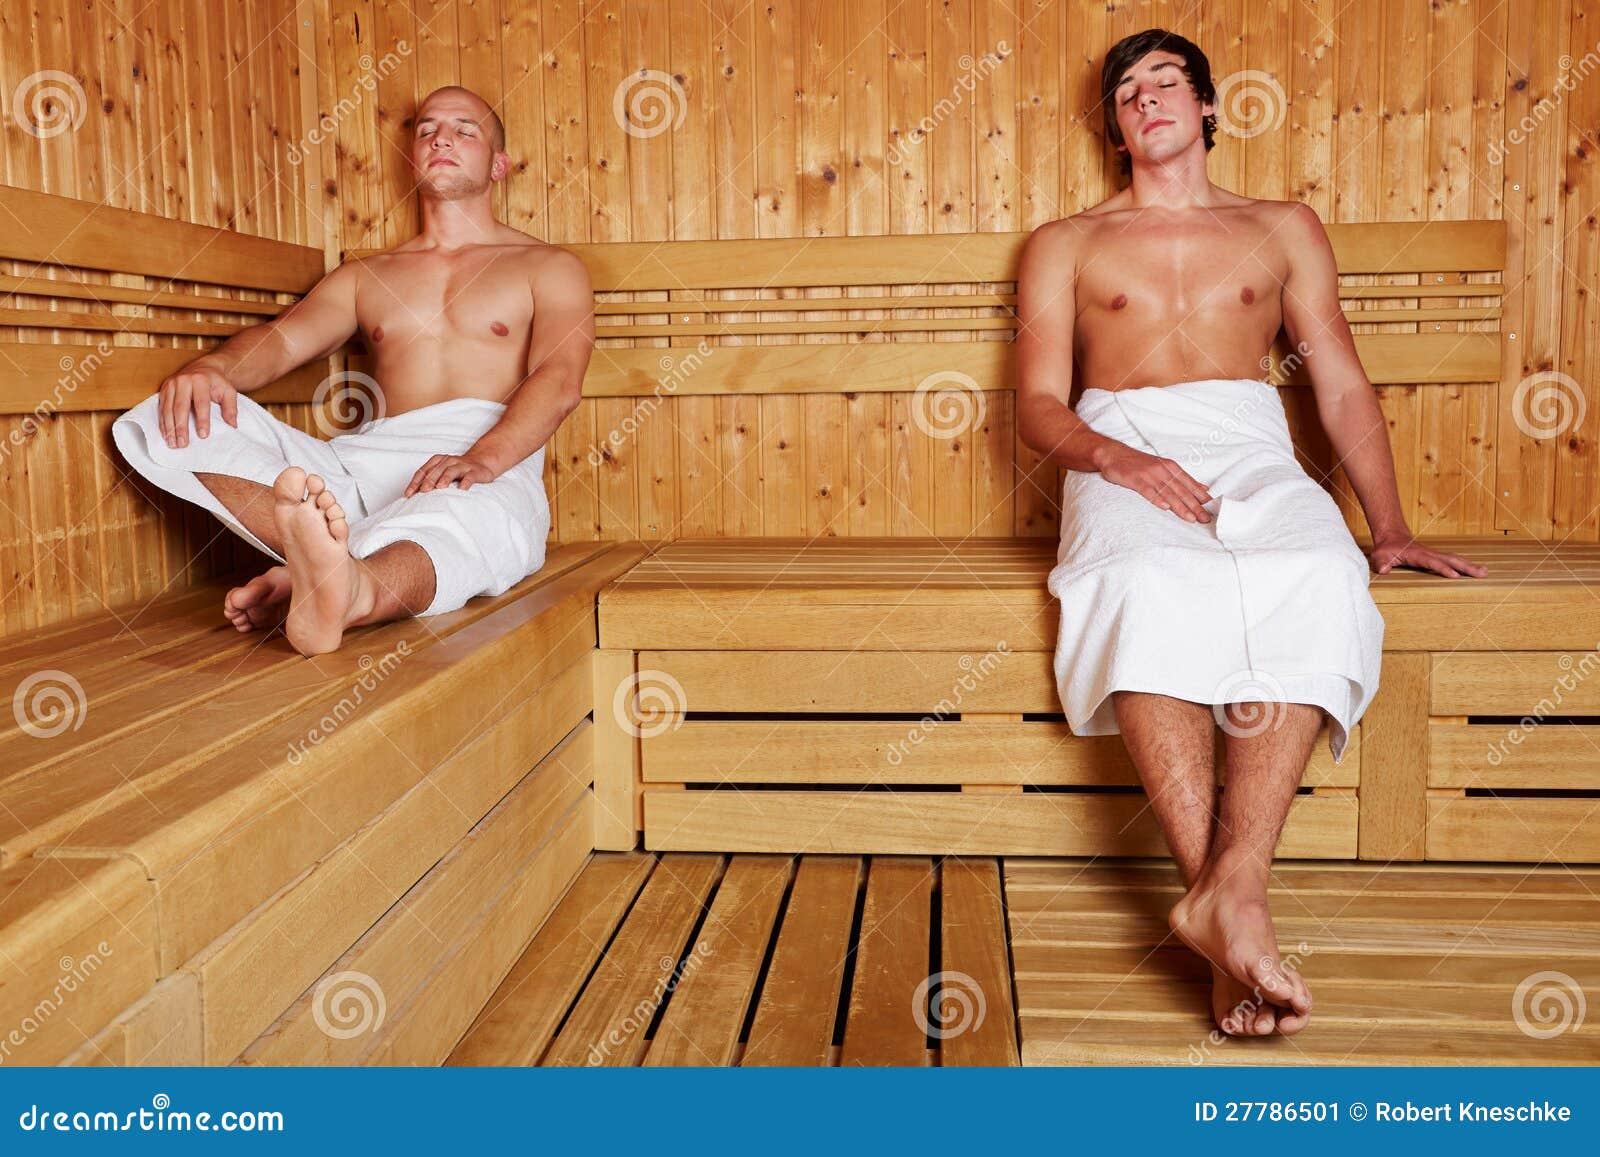 two men relaxing in sauna stock image image 27786501. Black Bedroom Furniture Sets. Home Design Ideas